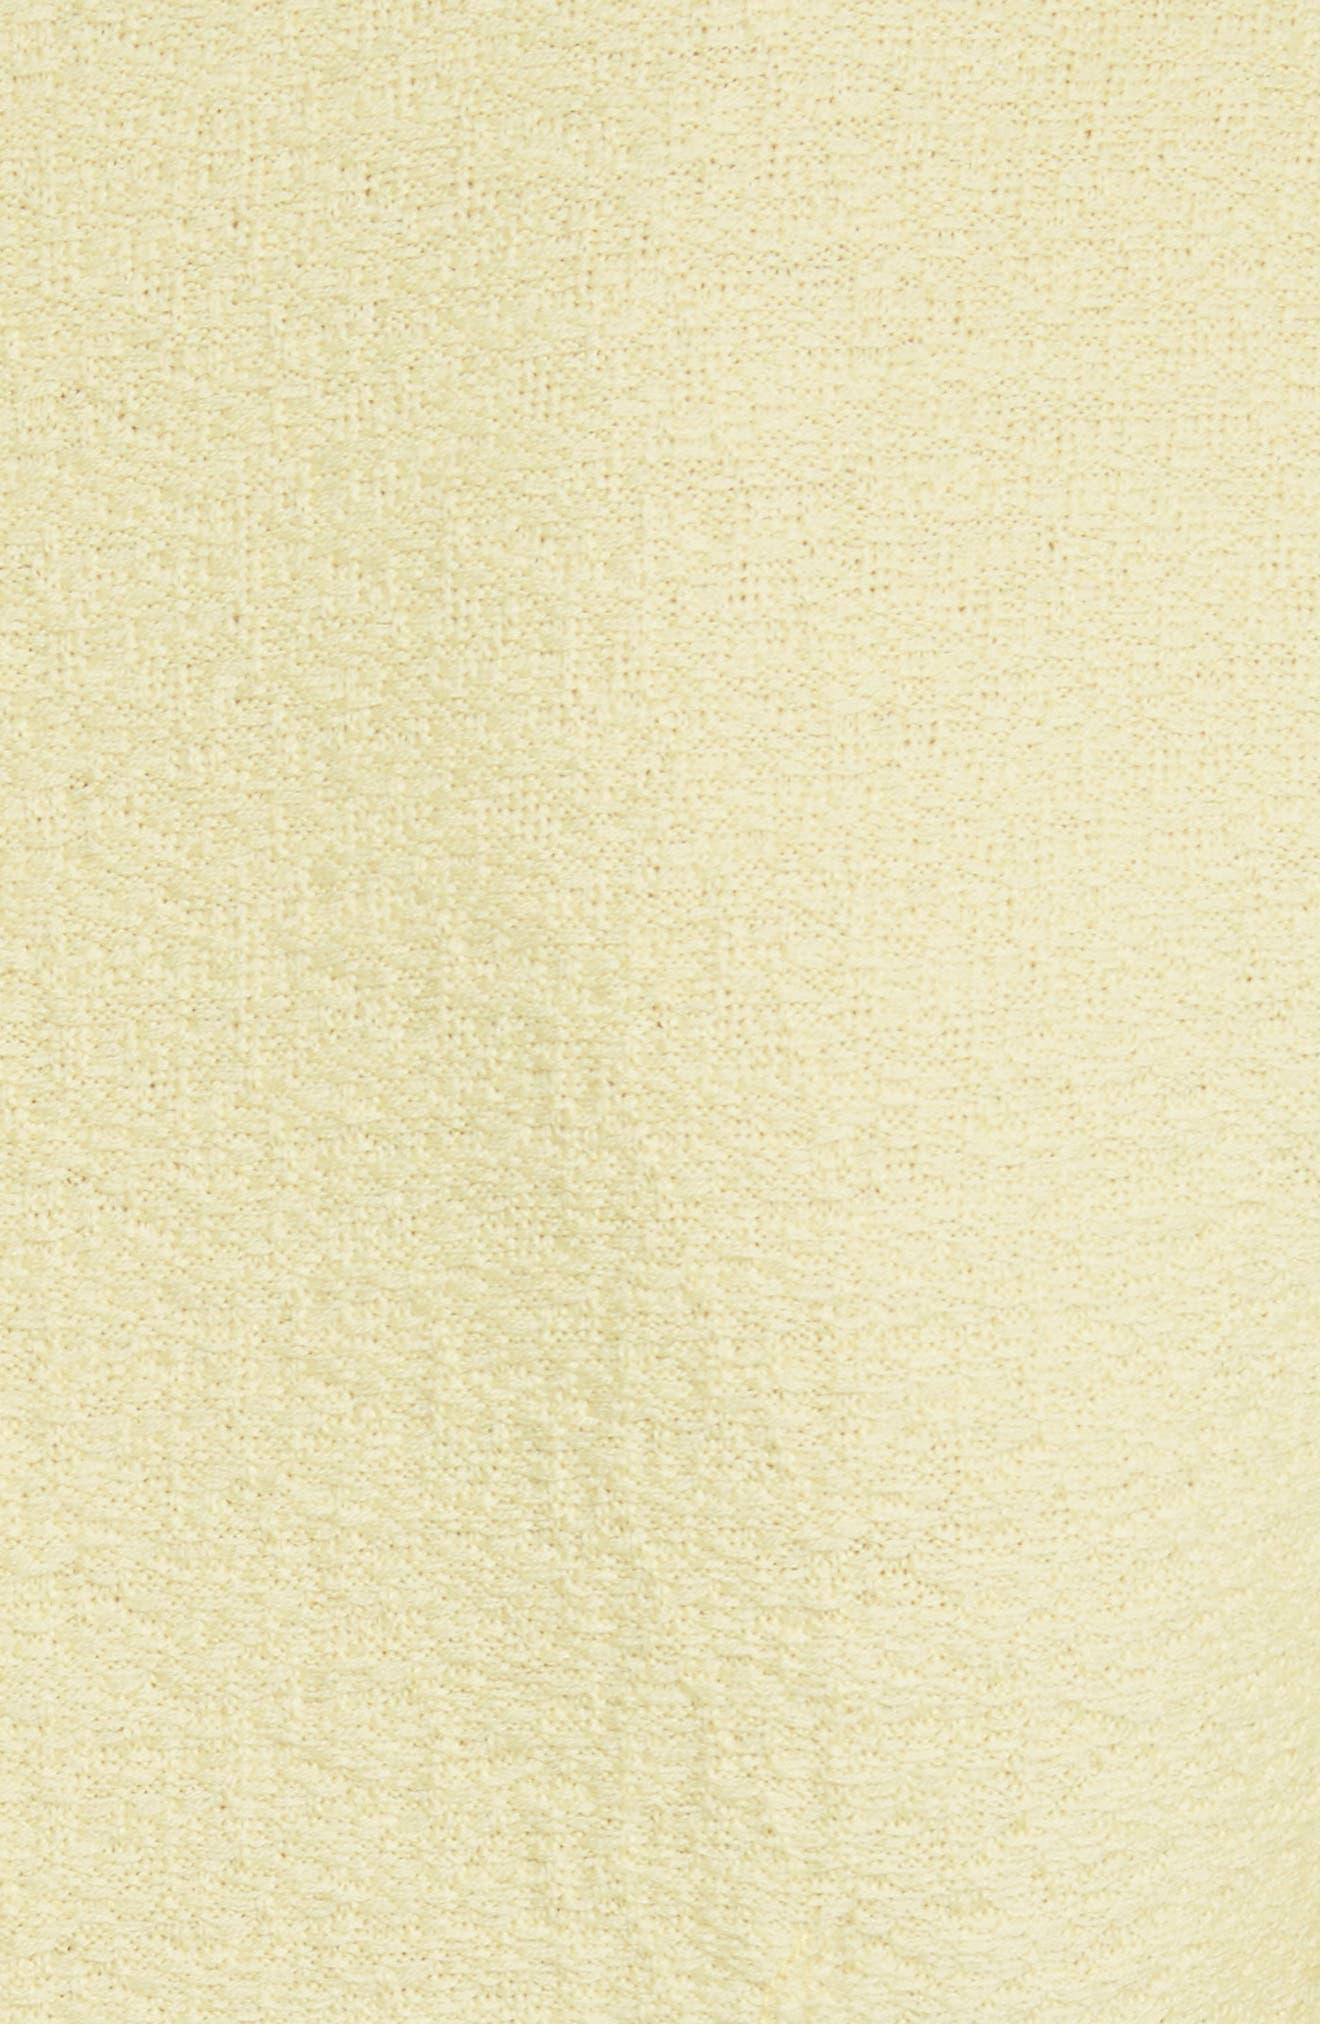 Hannah Knit Asymmetrical Sheath Dress,                             Alternate thumbnail 5, color,                             730